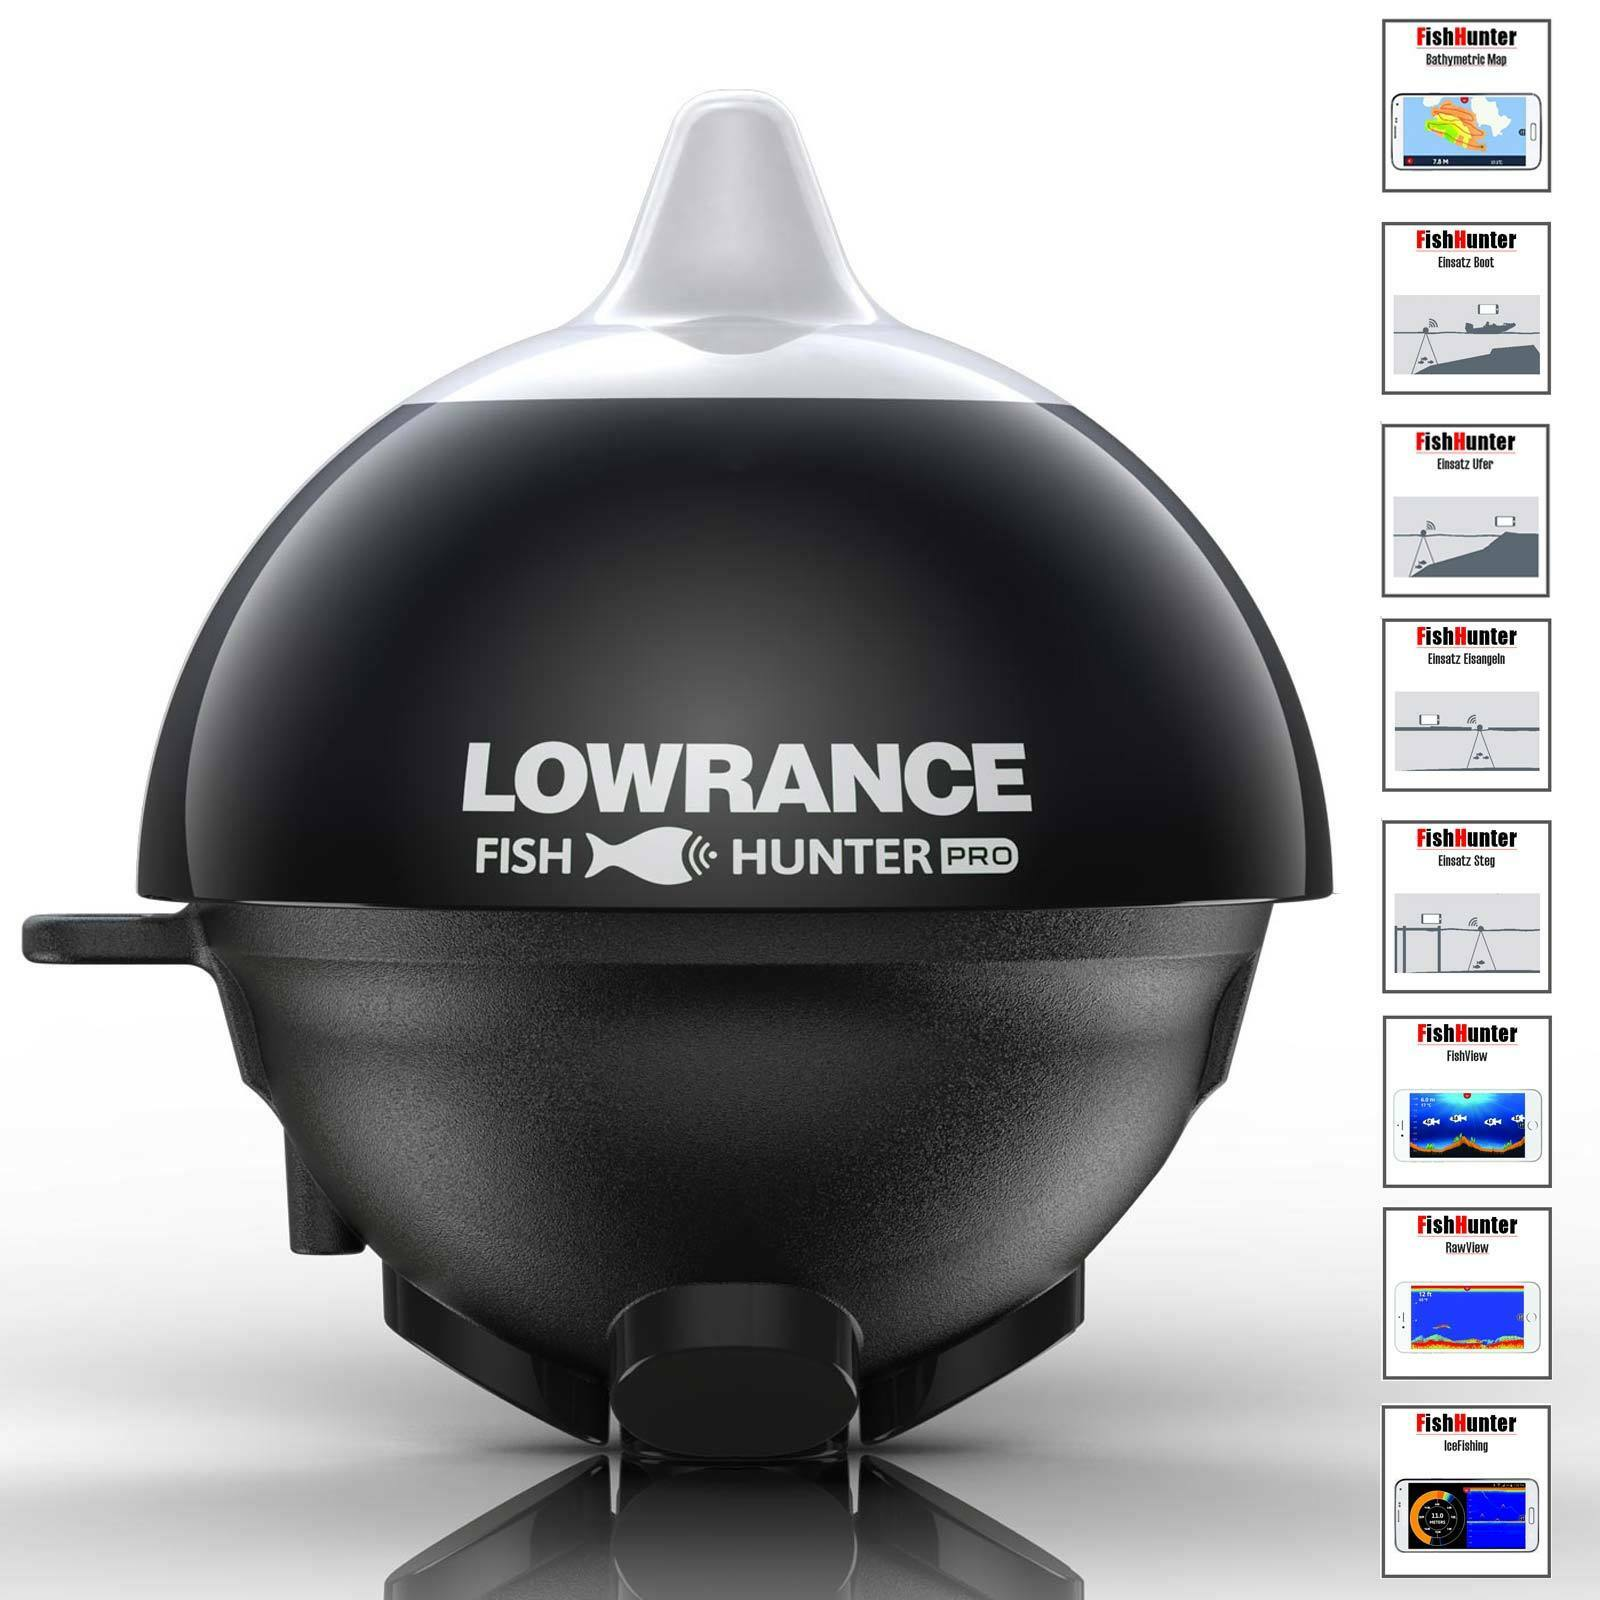 Lowrance FishHunter Pro WiFi - Uferangler Echolot